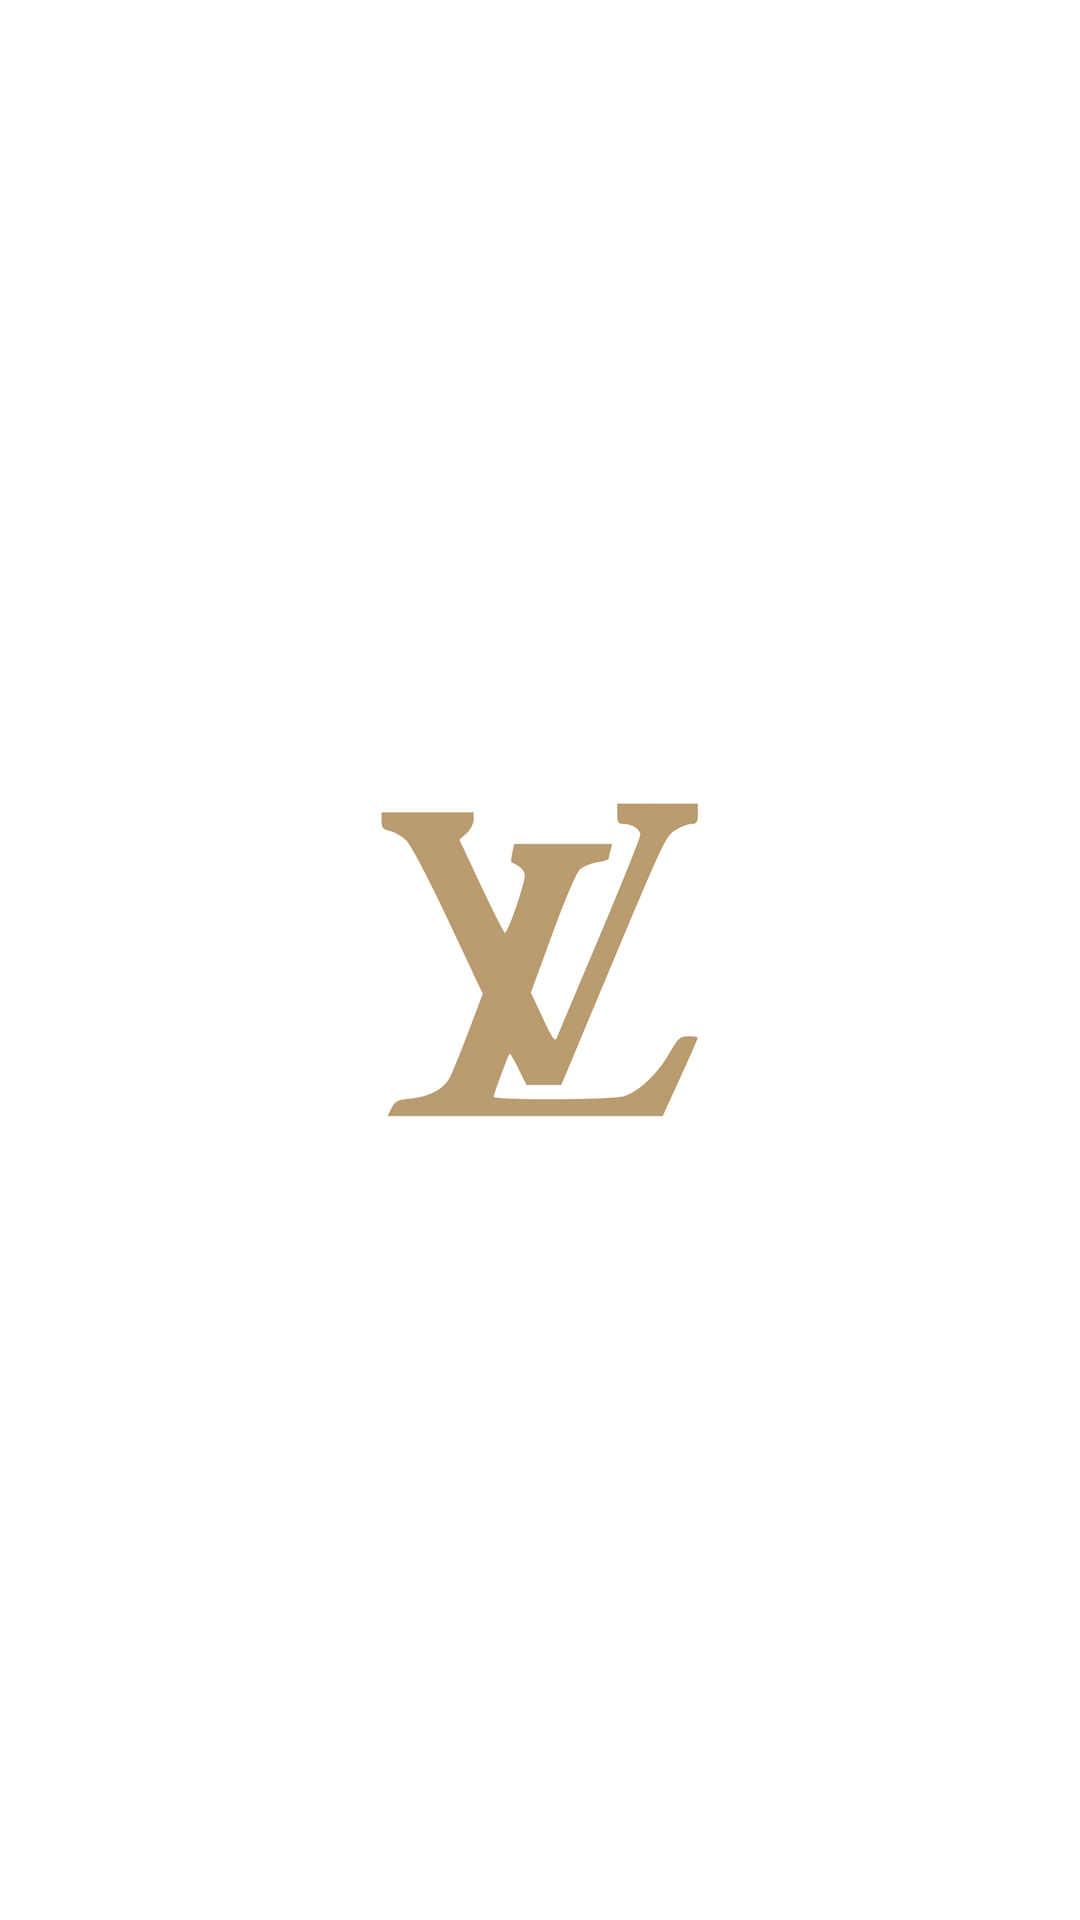 louisvuitton i15 - 20 LOUIS VUITTON HQ Smartphone Wallpaper Collection